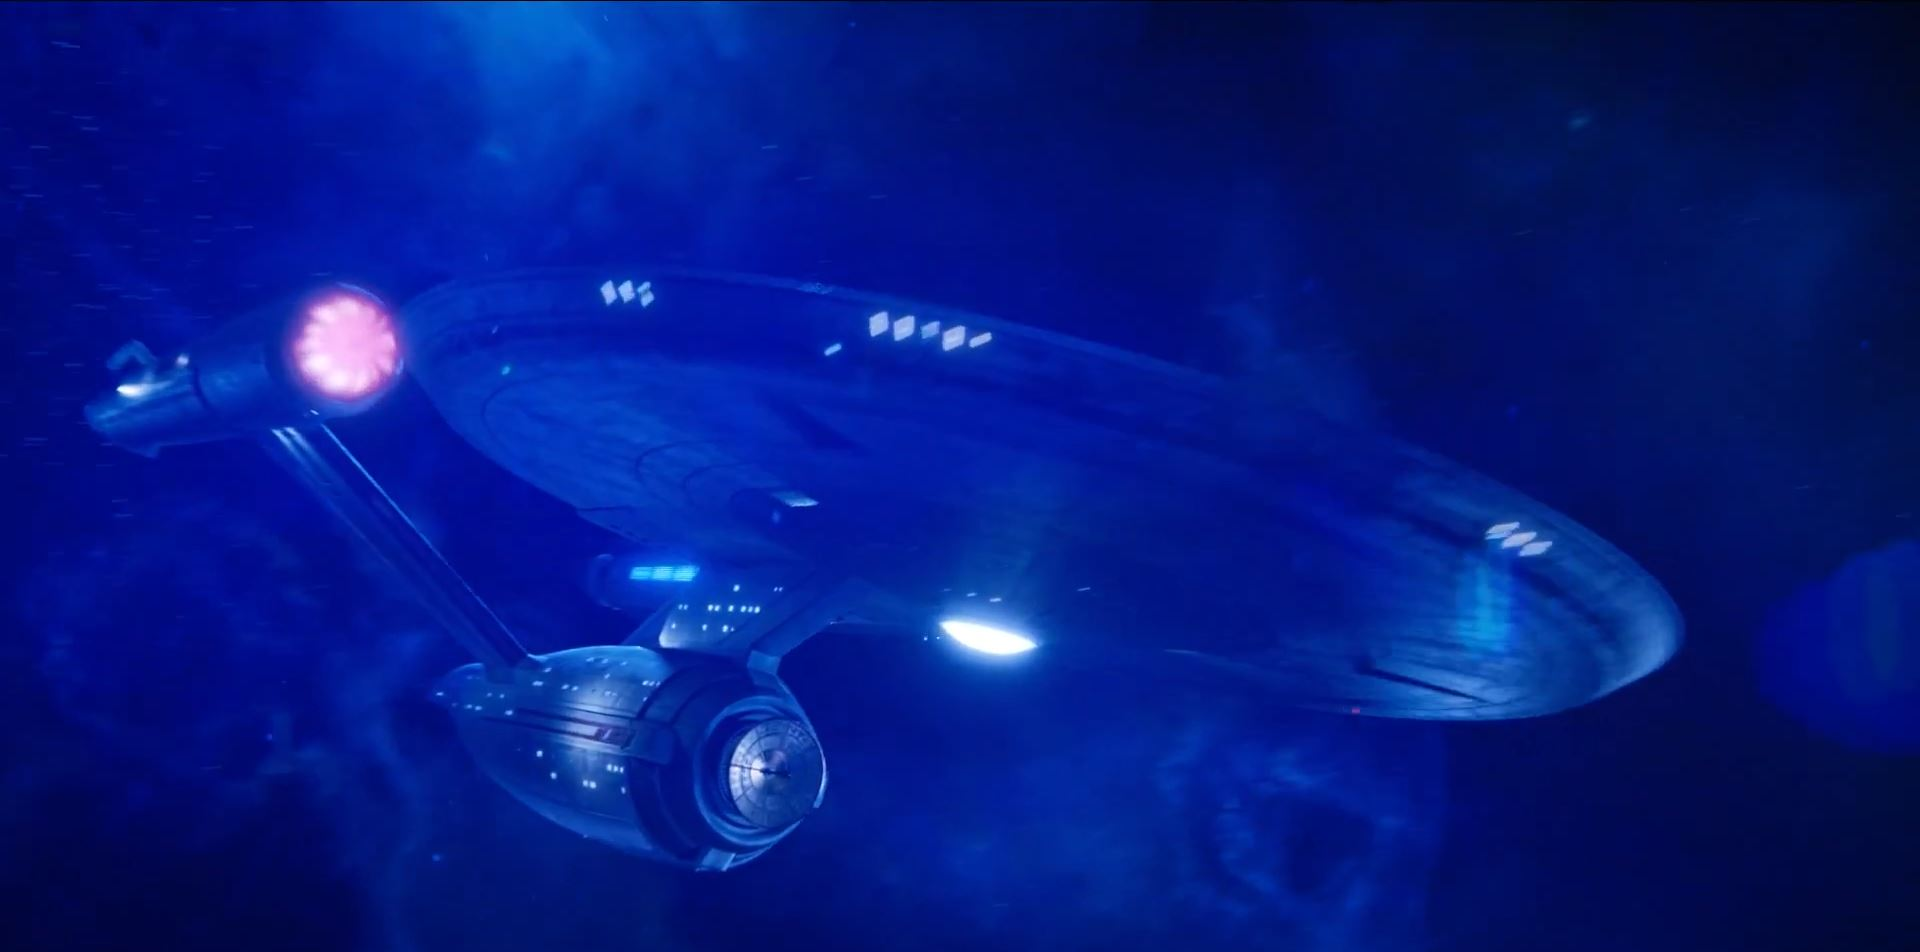 Star Trek Discovery - The Enterprise